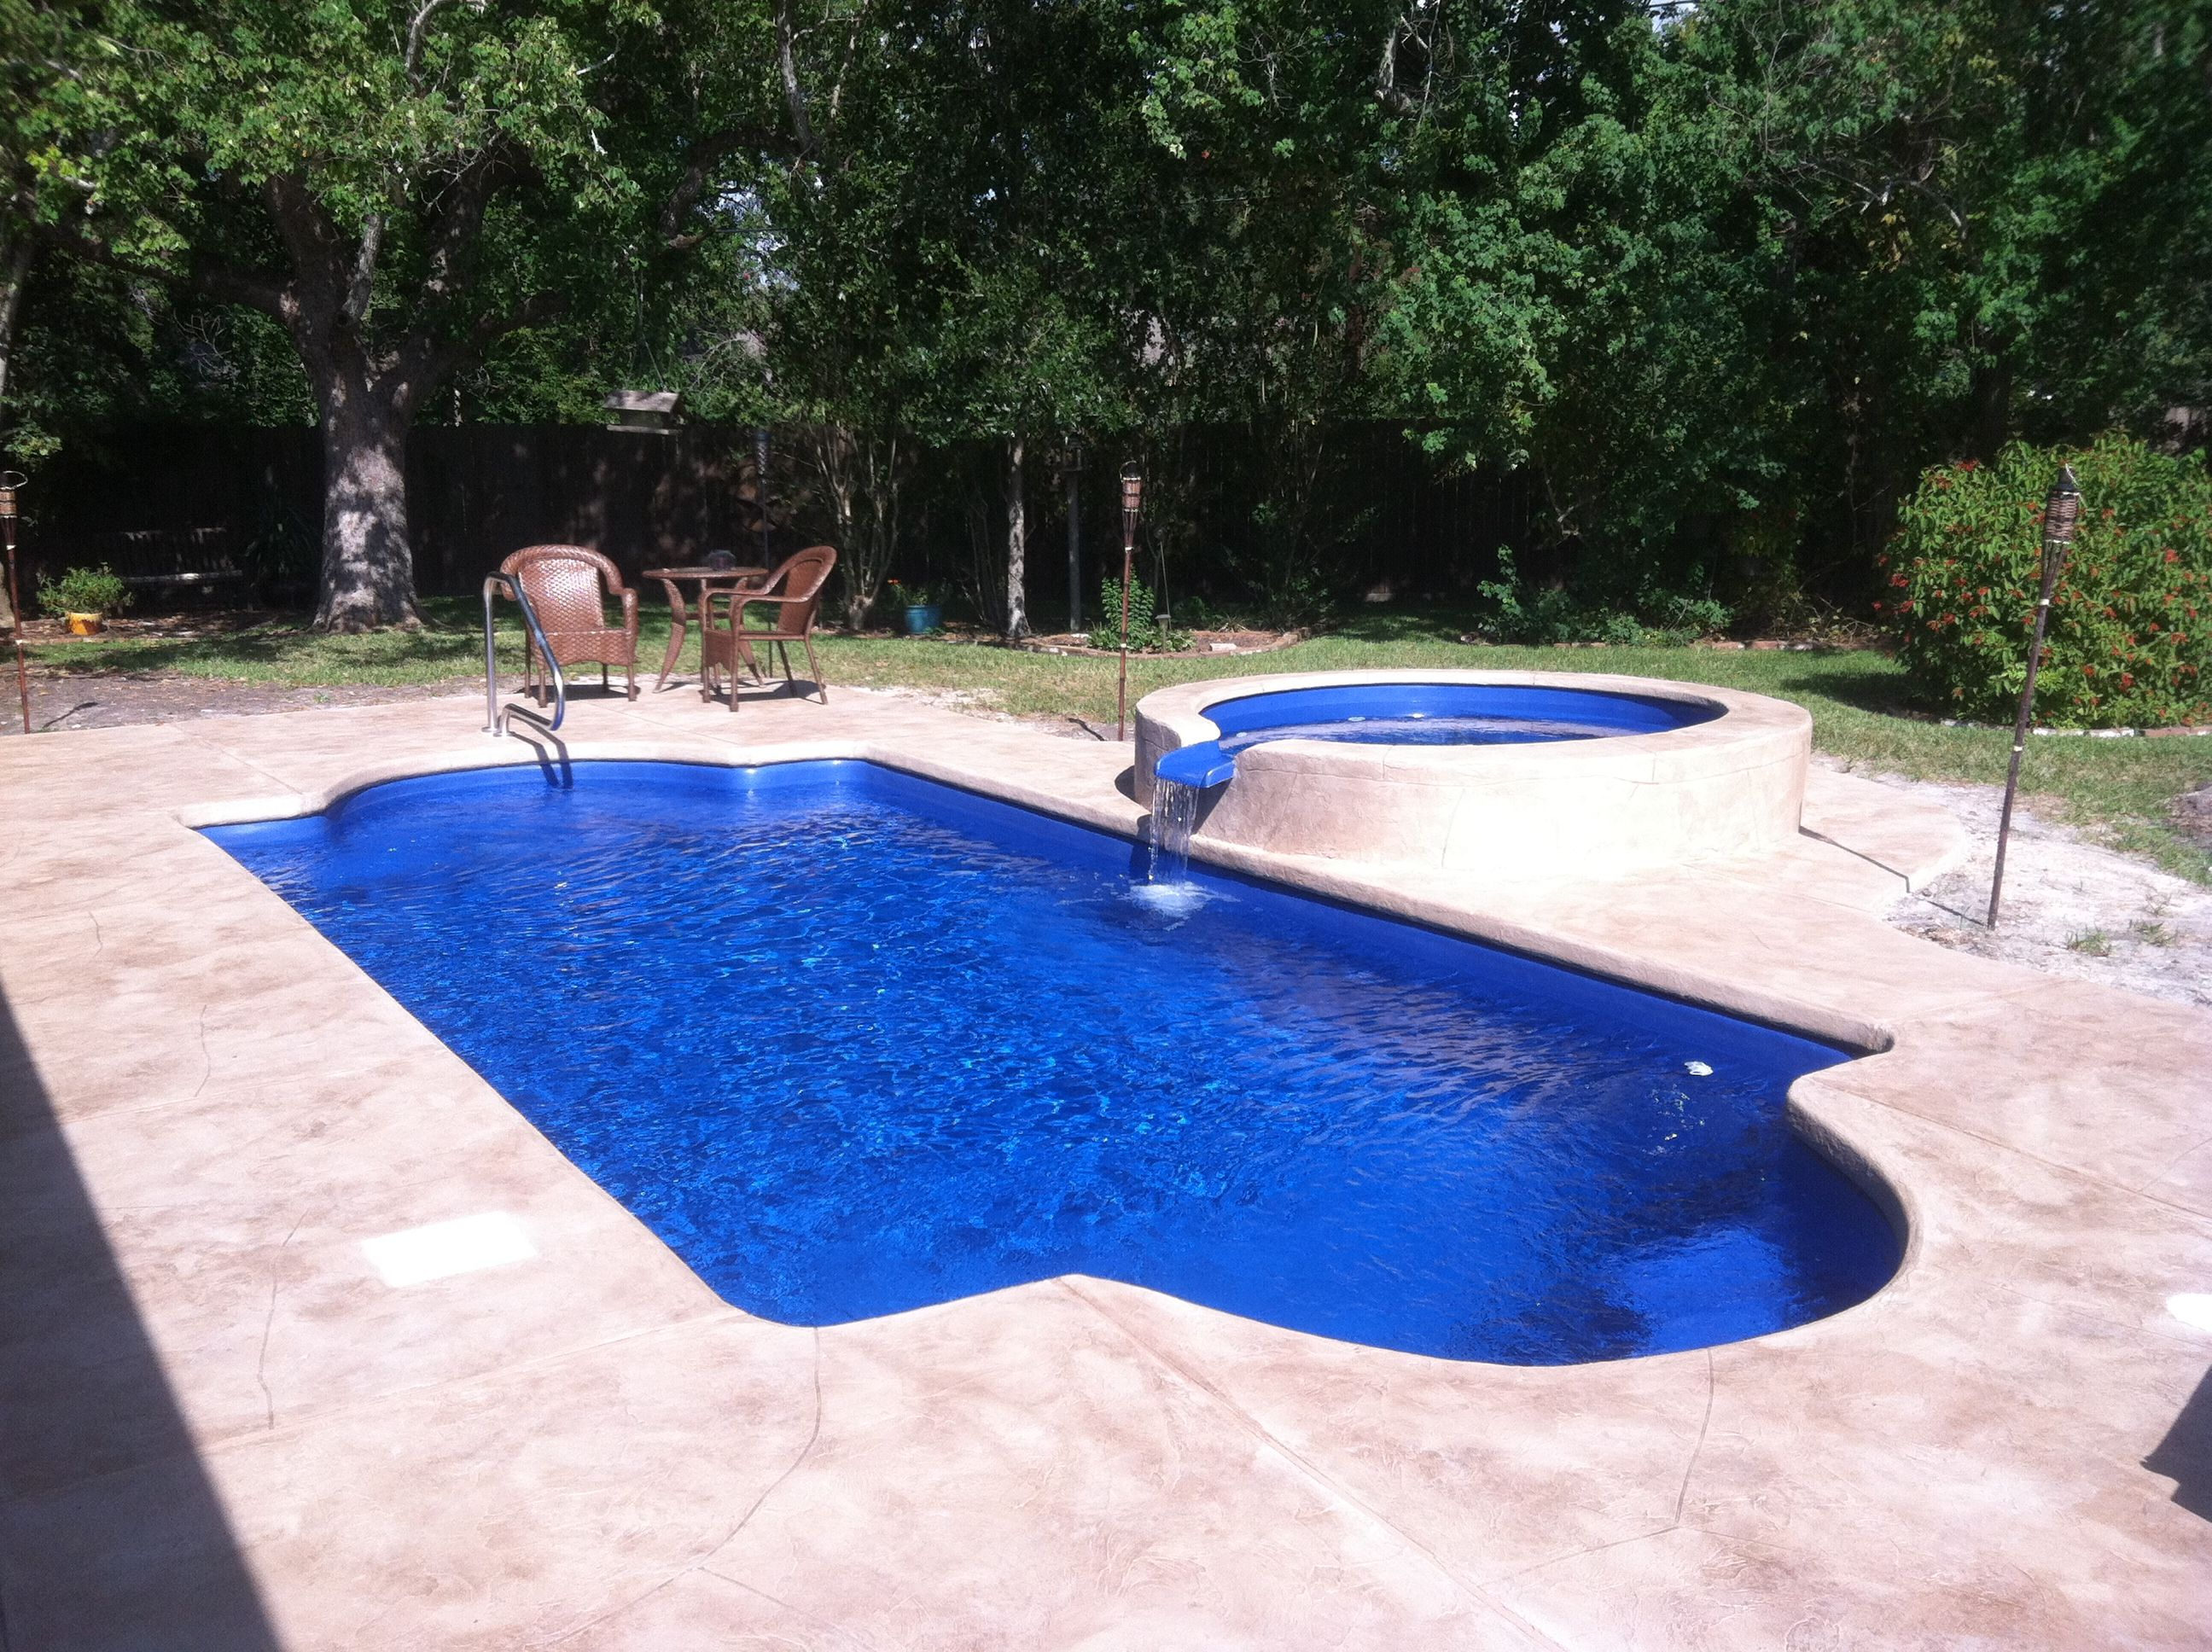 Swimming Pool Minimalist Design Fiberglass Swimming Pool And Spa ...